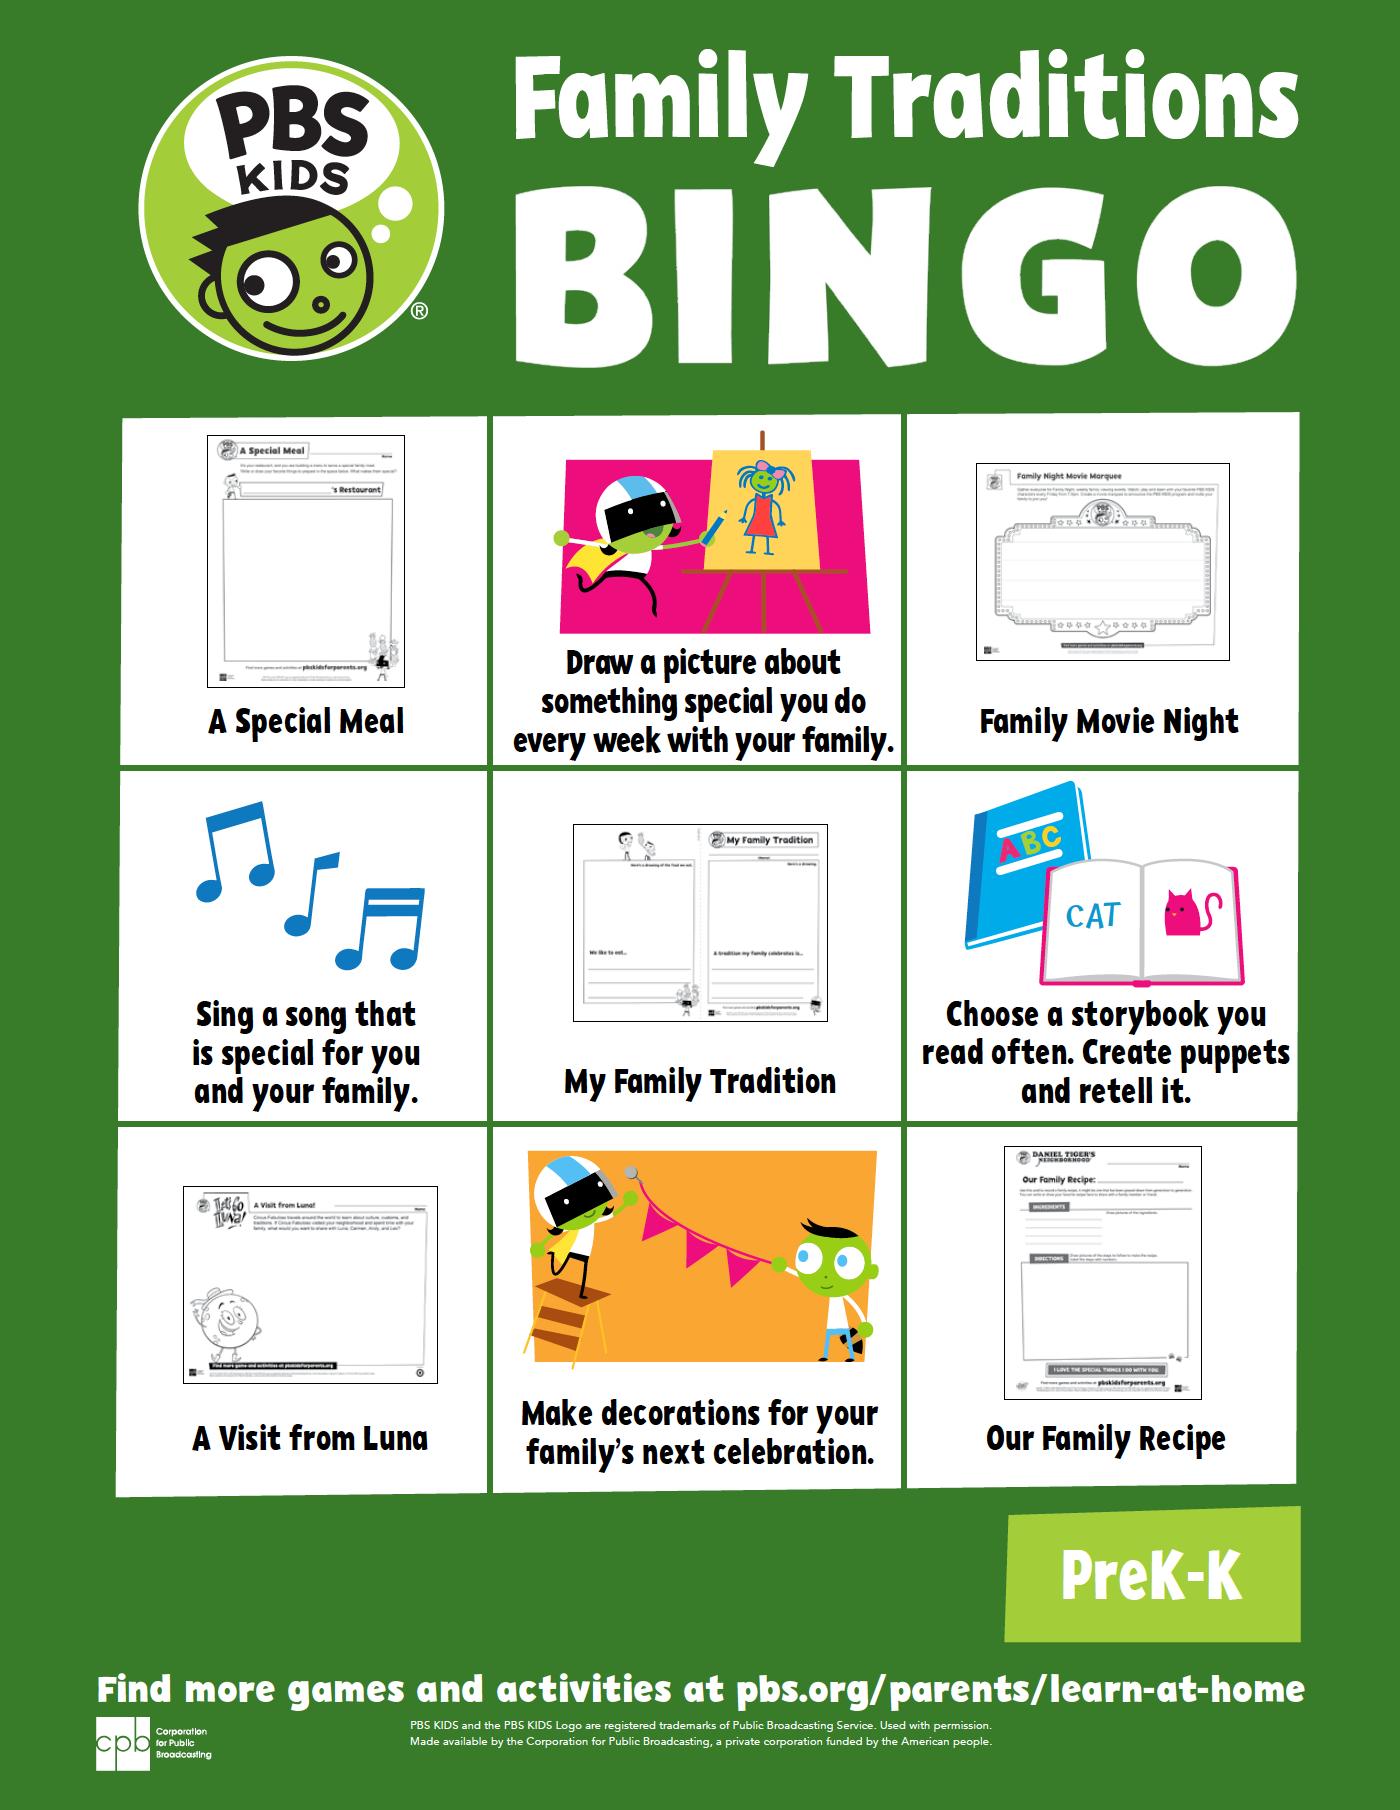 Family Traditions bingo card